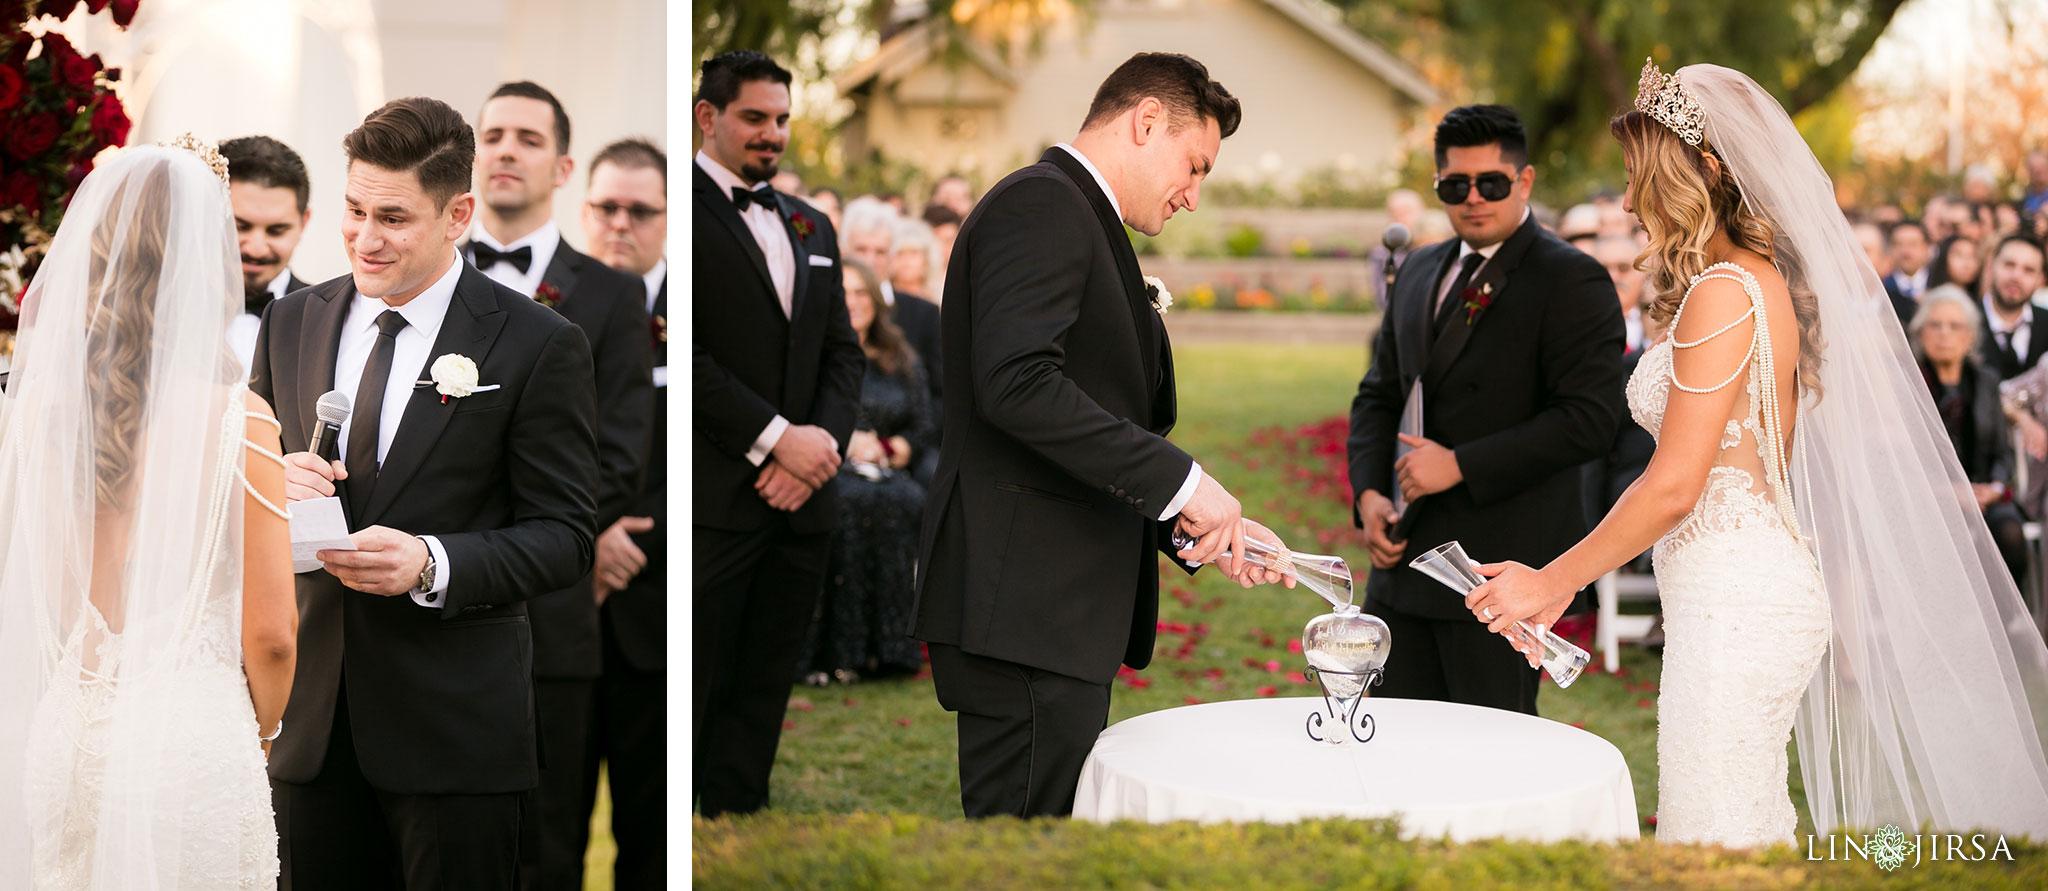 18 richard nixon library wedding ceremony photography